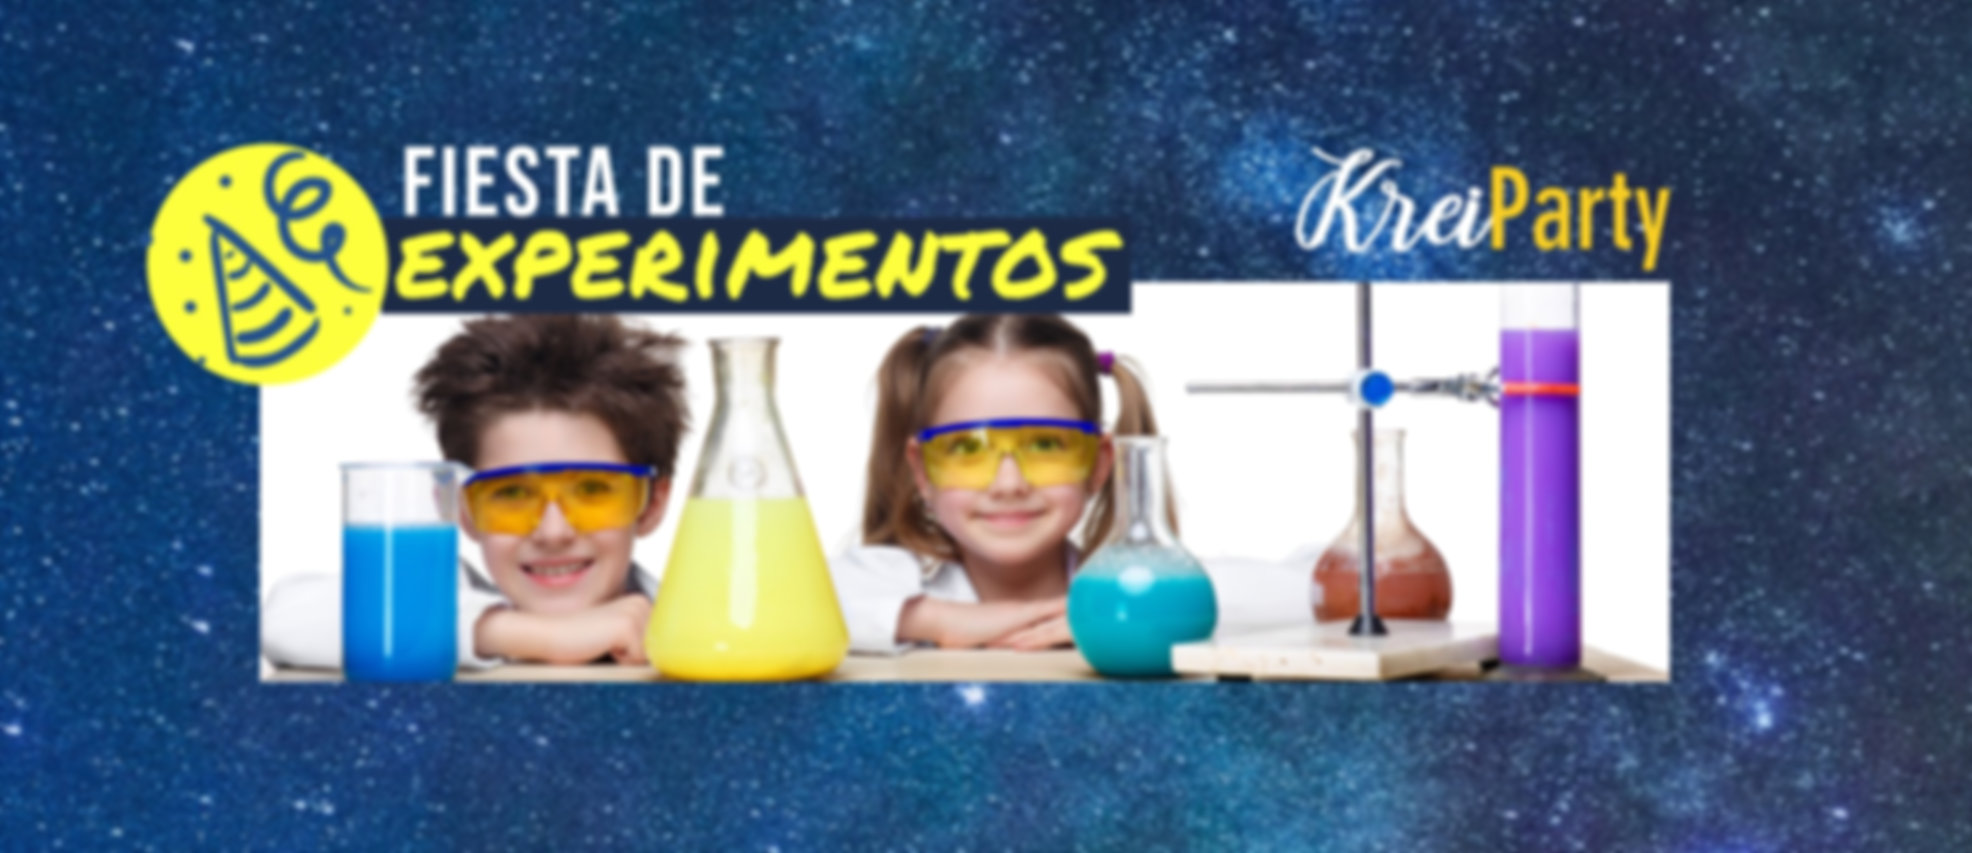 Fiesta de experimentos